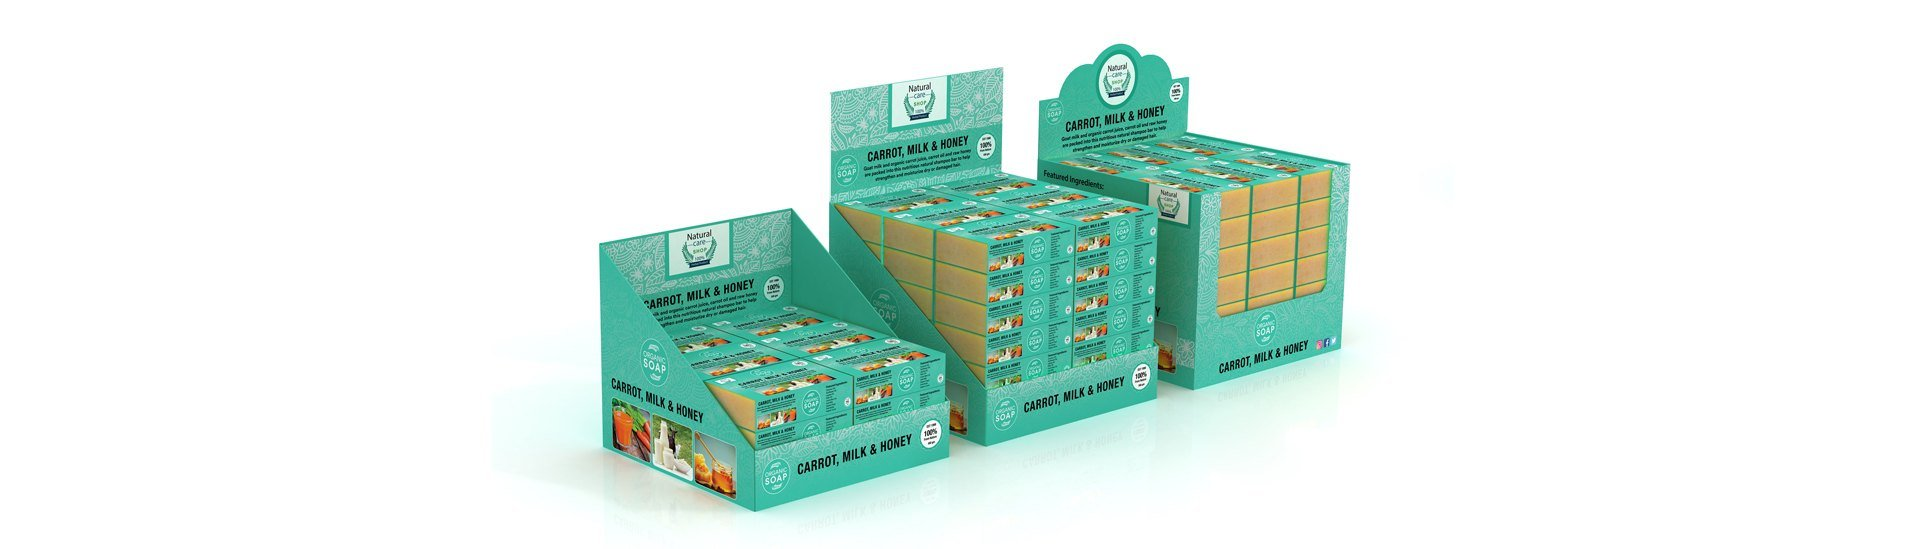 Cardboard Display Box Manufacturer